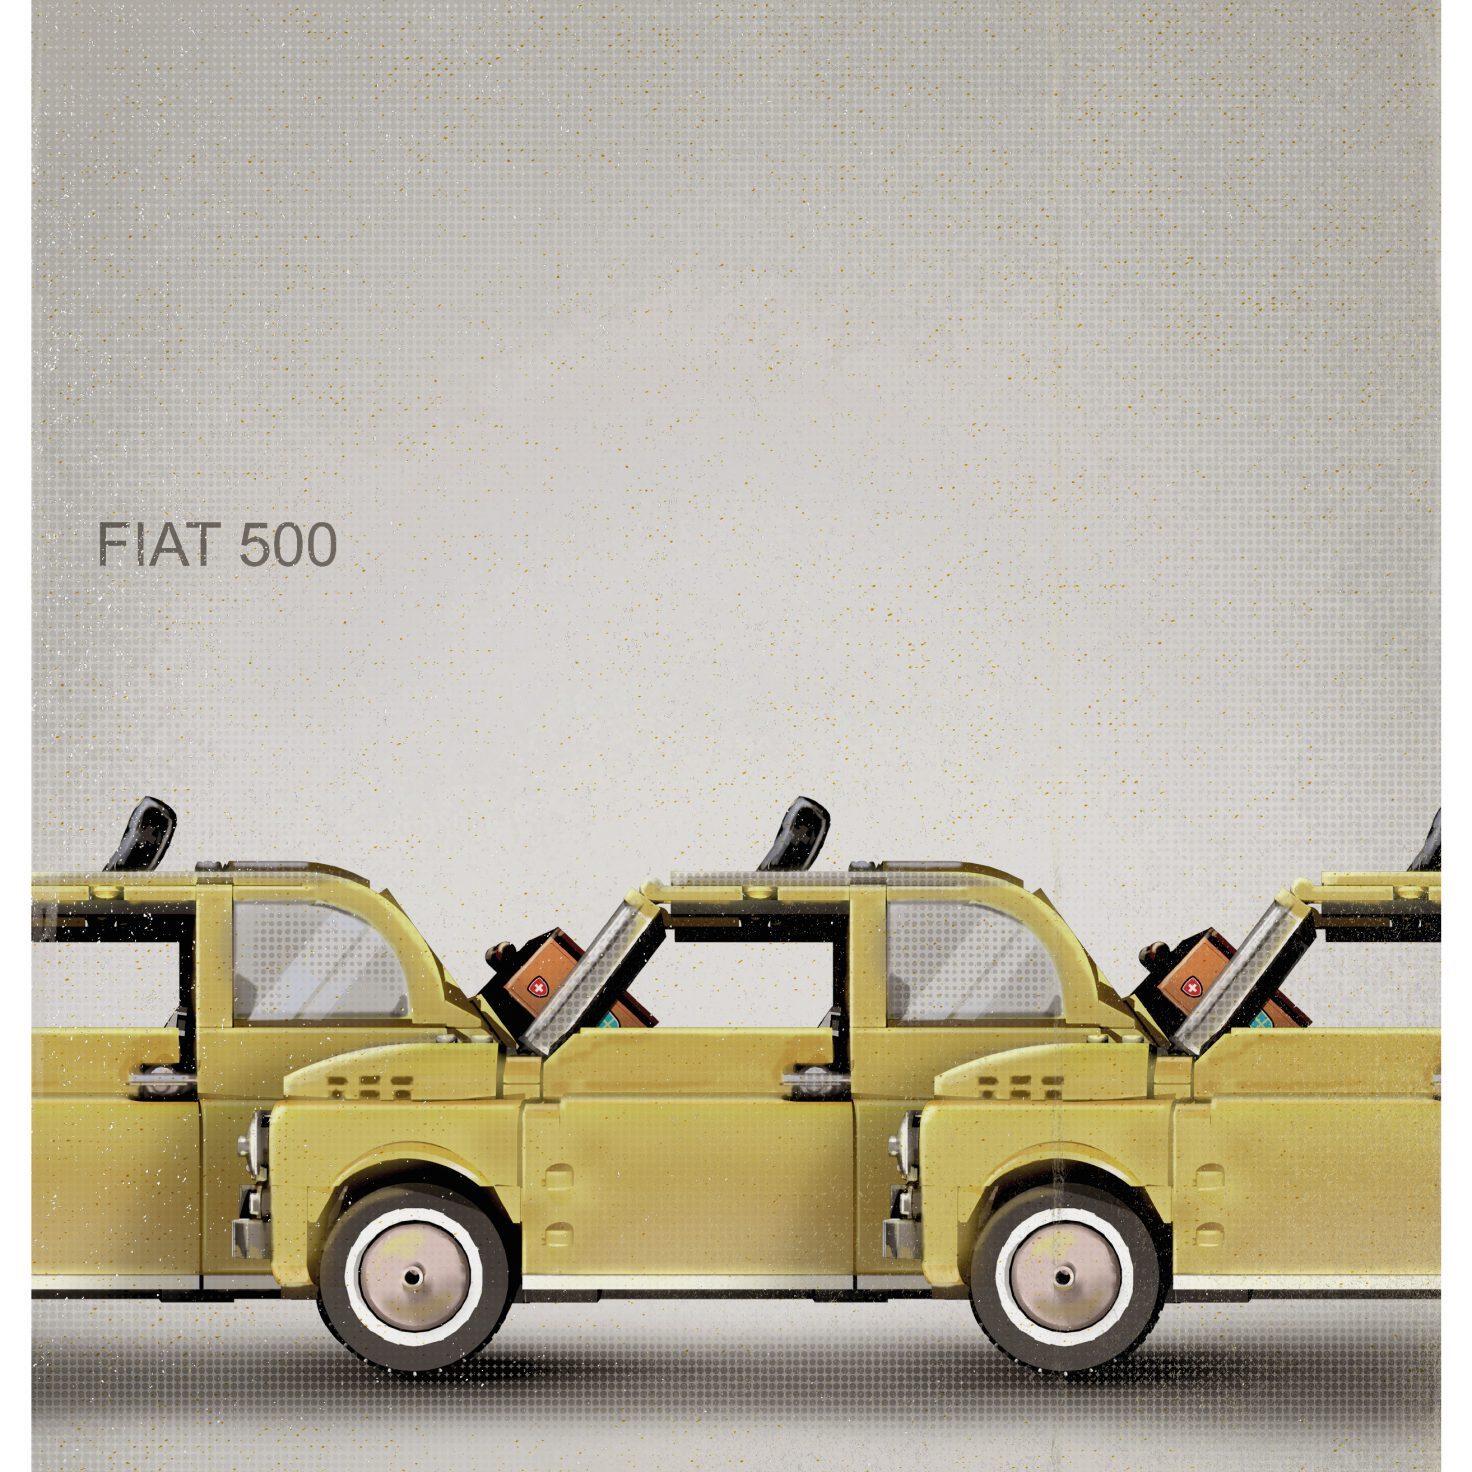 LEGO fiat 500 poster